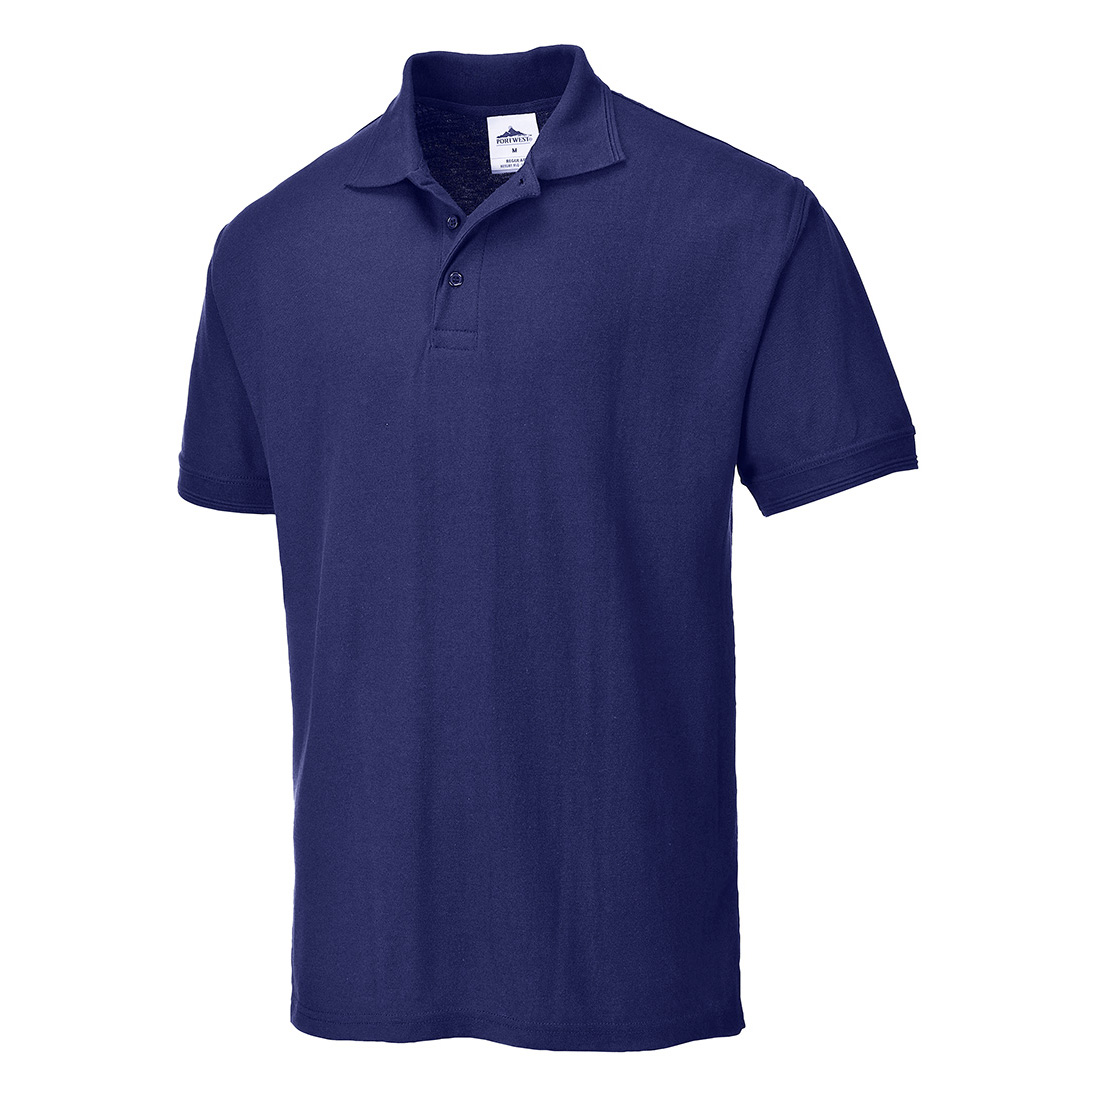 Naples Polo Shirt Navy XXLR